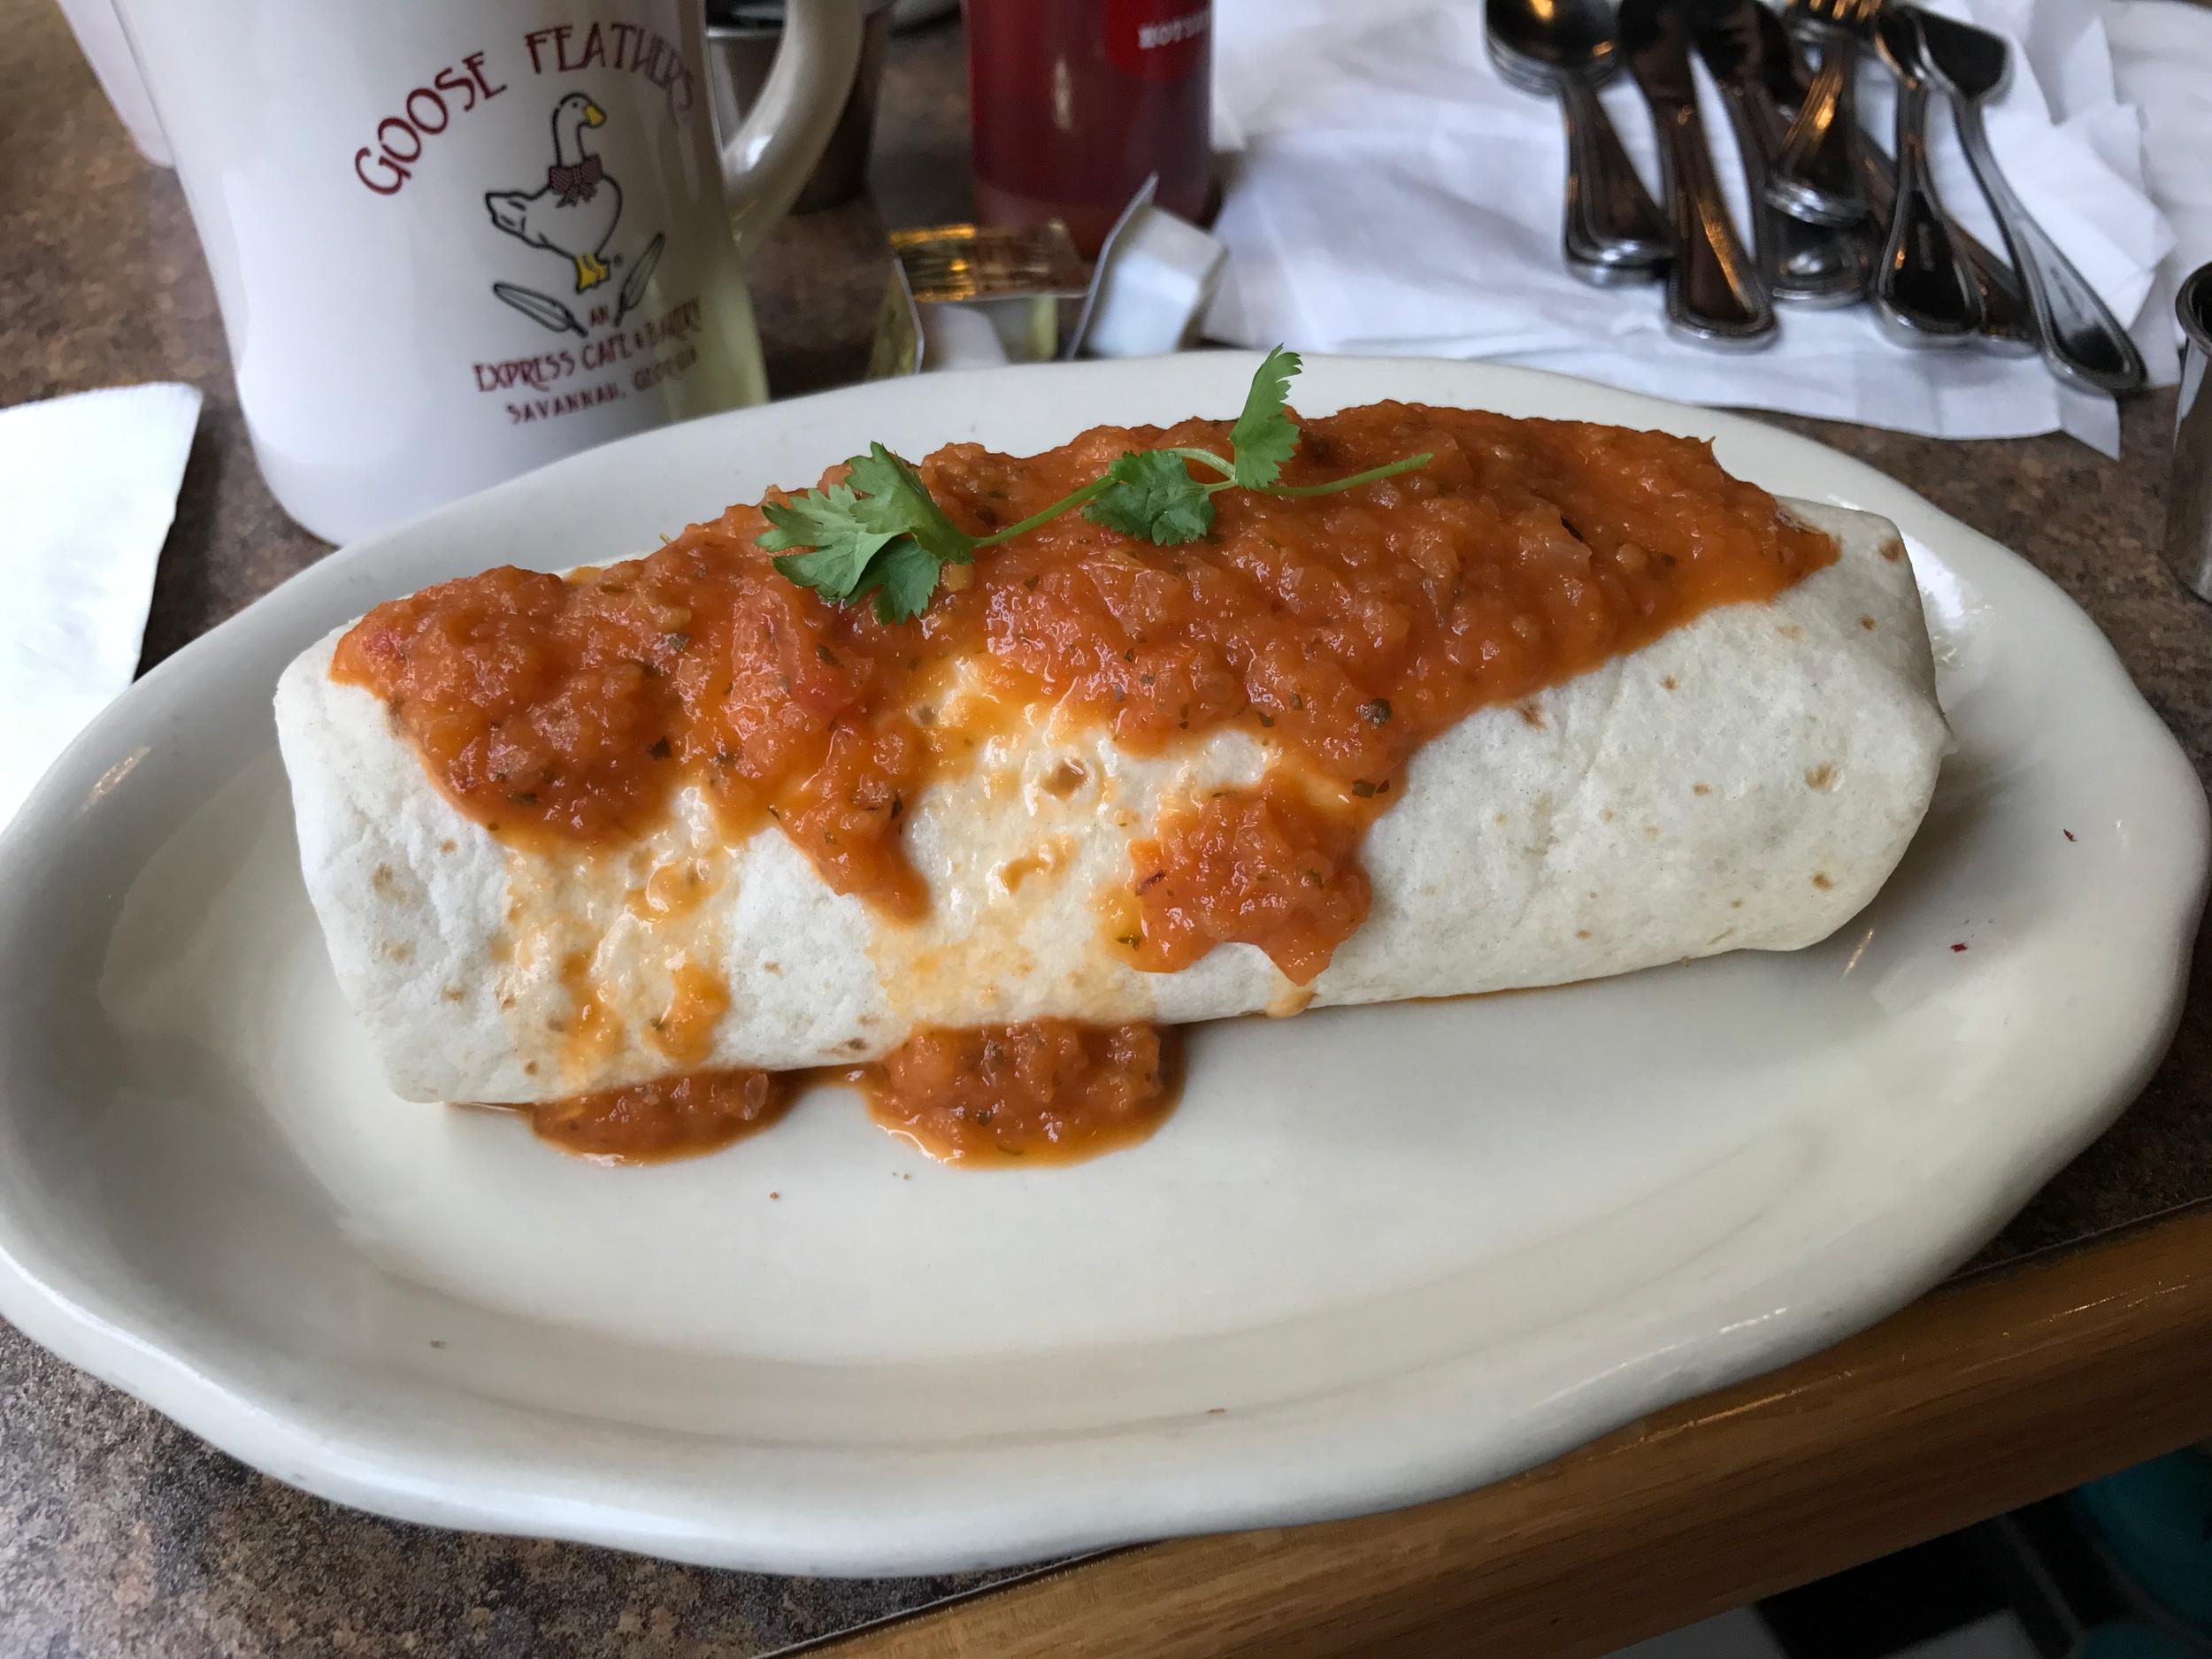 I had a tasty breakfast burrito.  (click to enlarge)